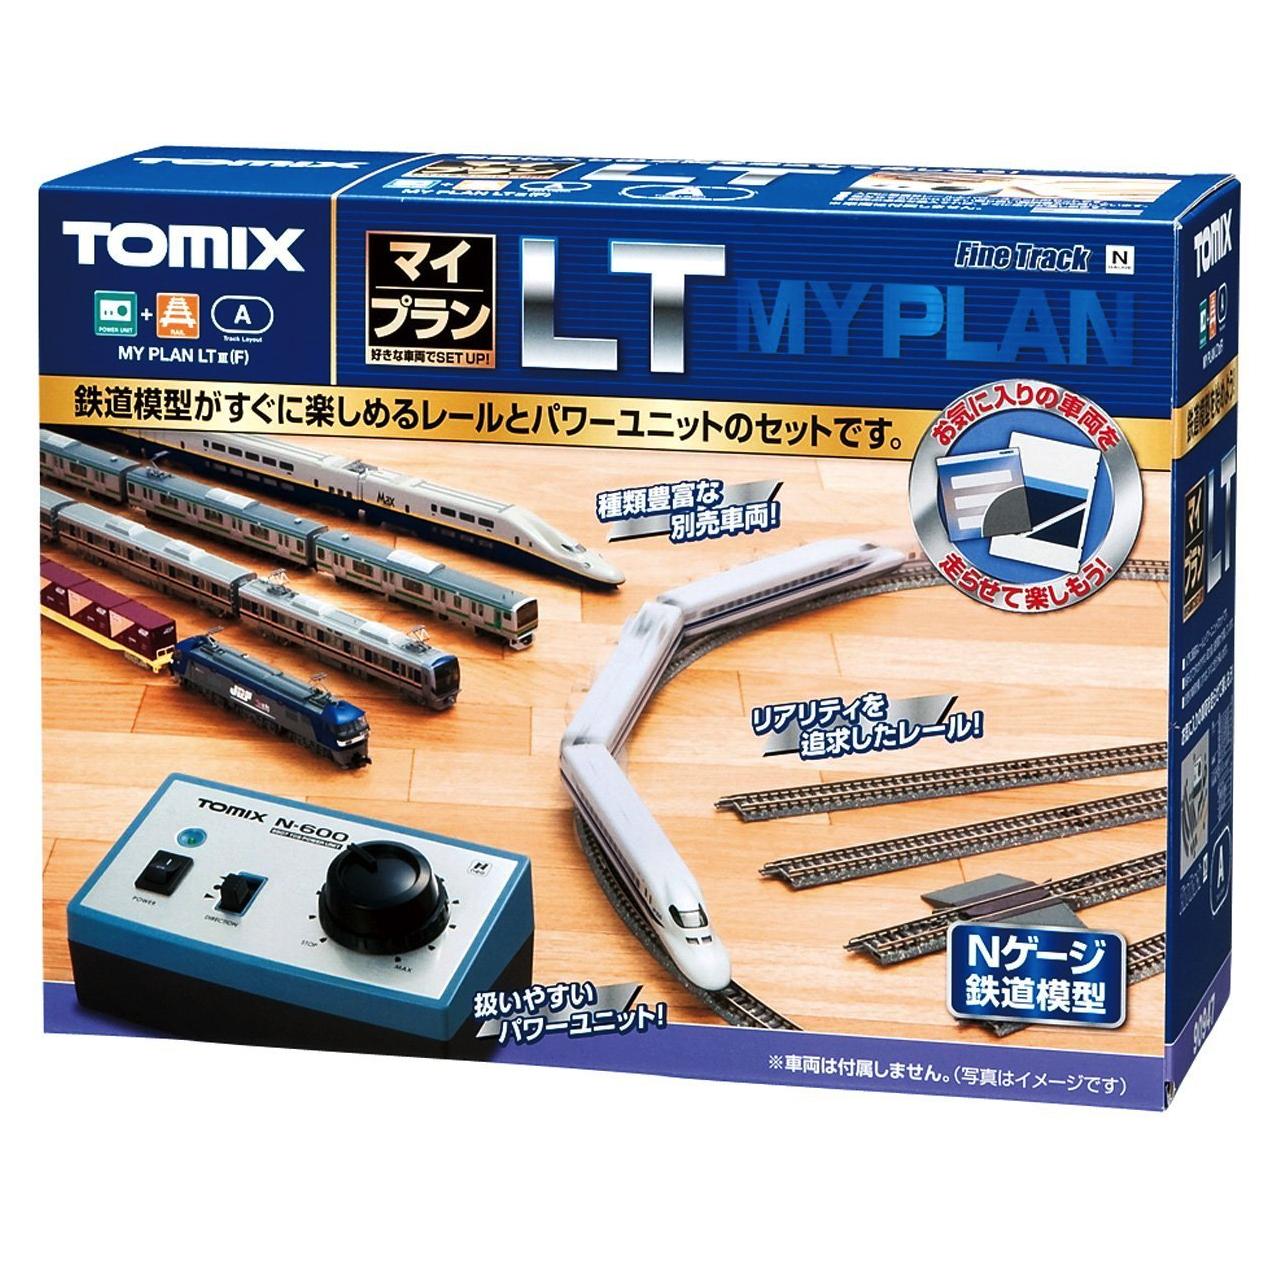 Tomix 90947 My Plan LT III F  - N